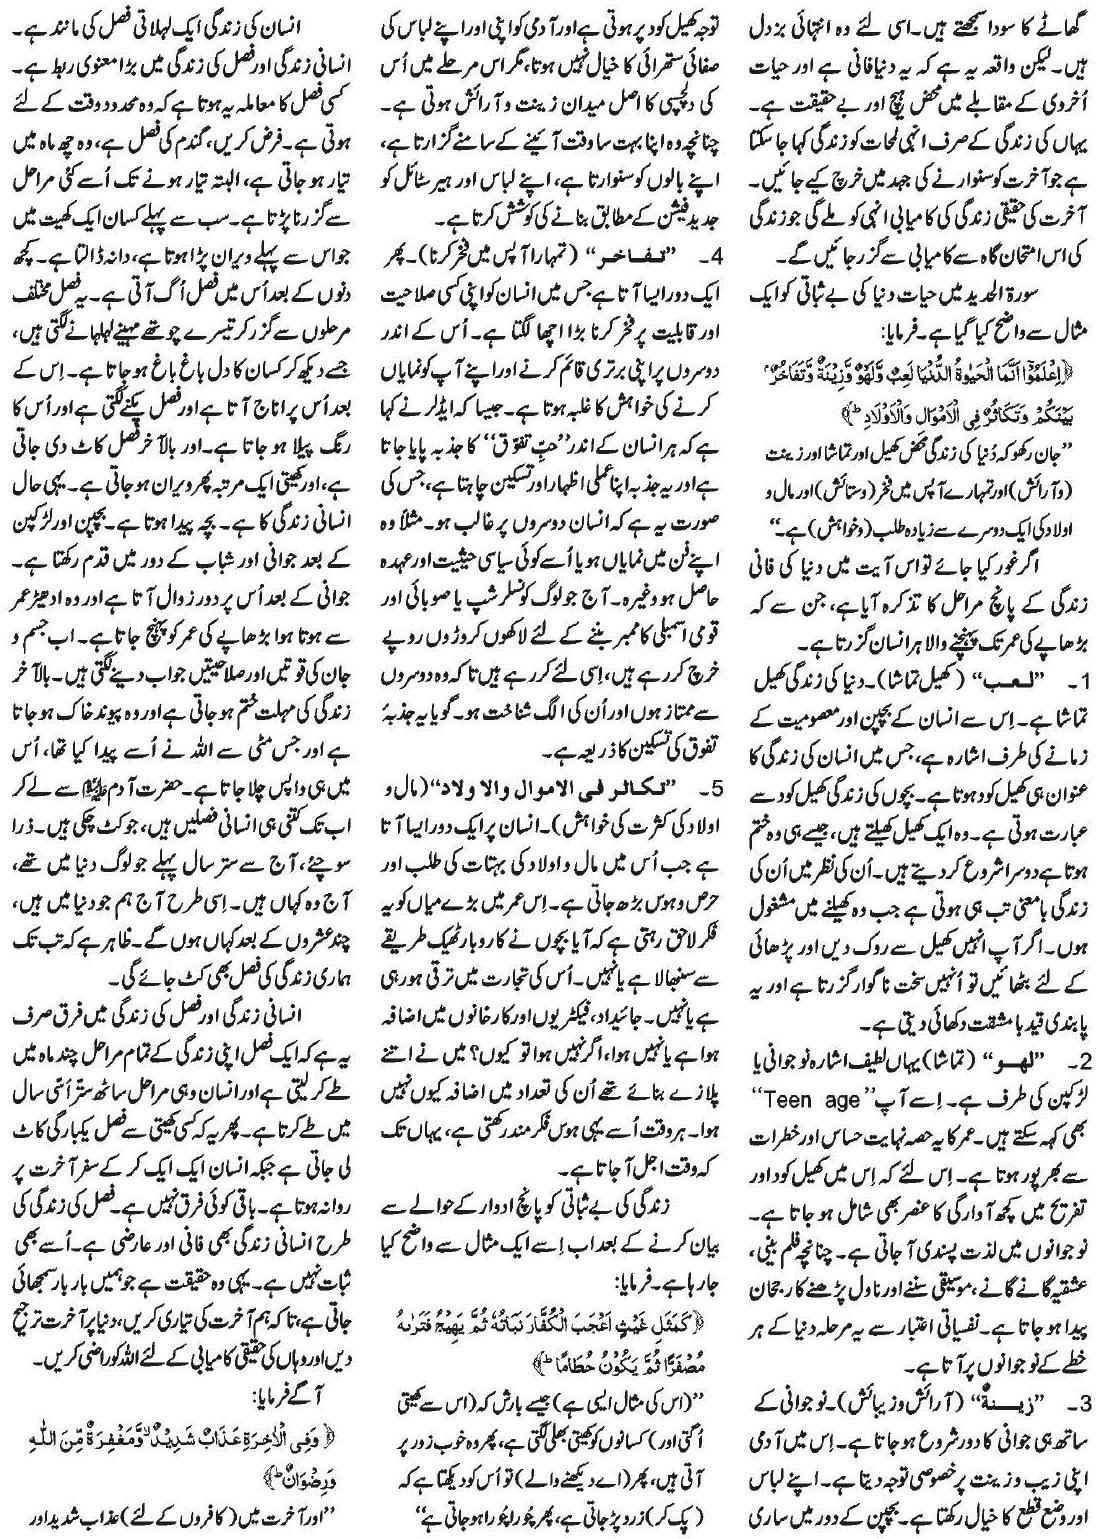 Pin Urdu Love Letter Tafreeh Mela Pakistani Forum On Pinterest